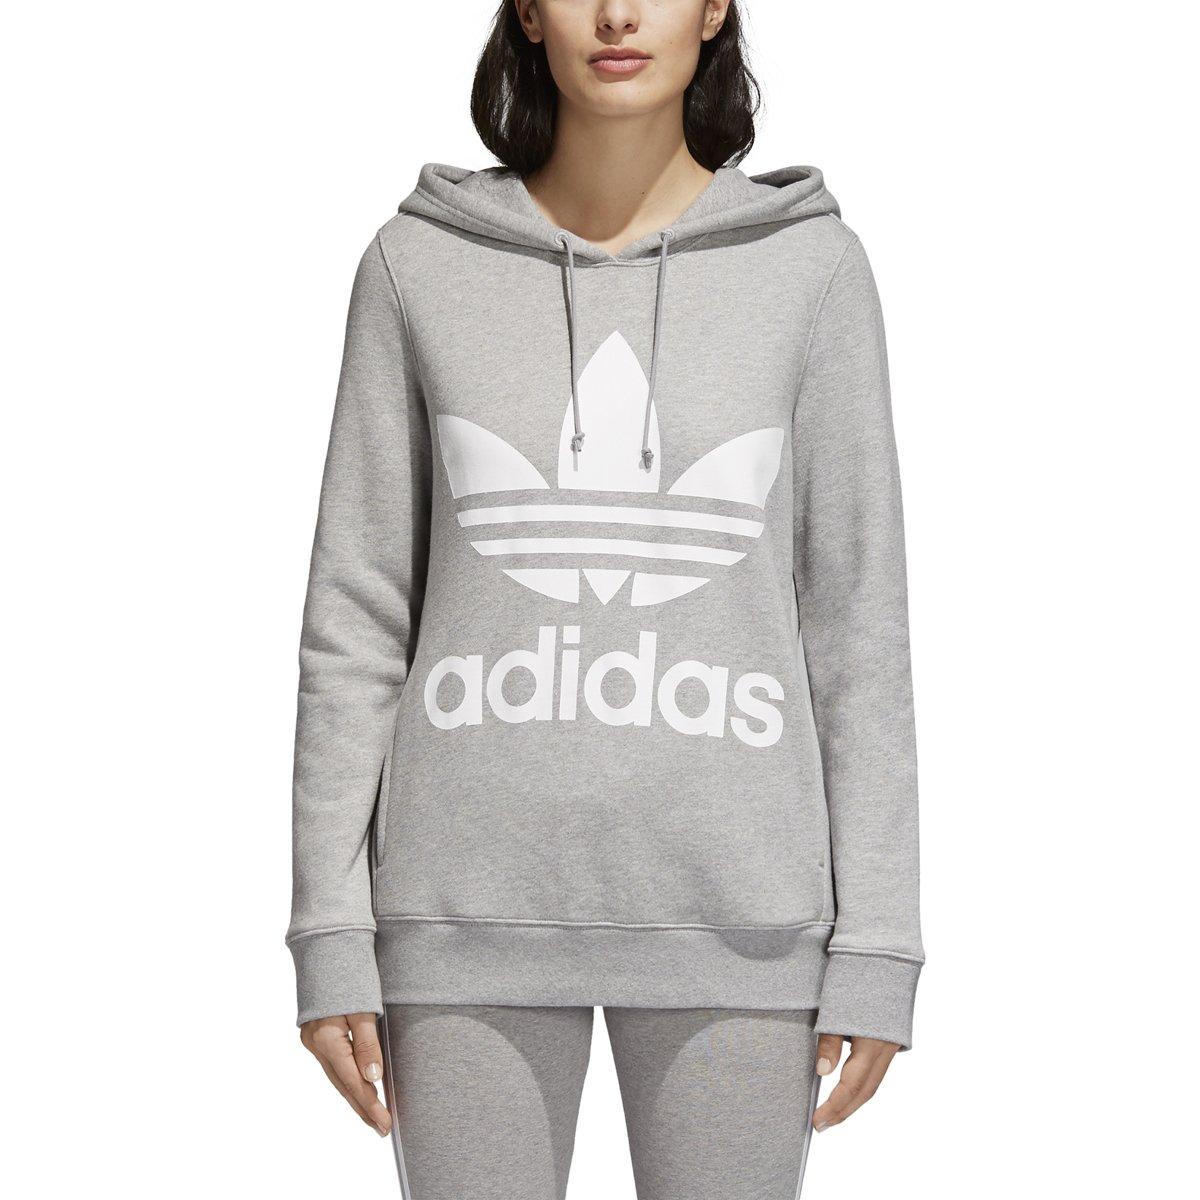 adidas Originals Women's Trefoil Hoodie, Medium Grey Heather, M